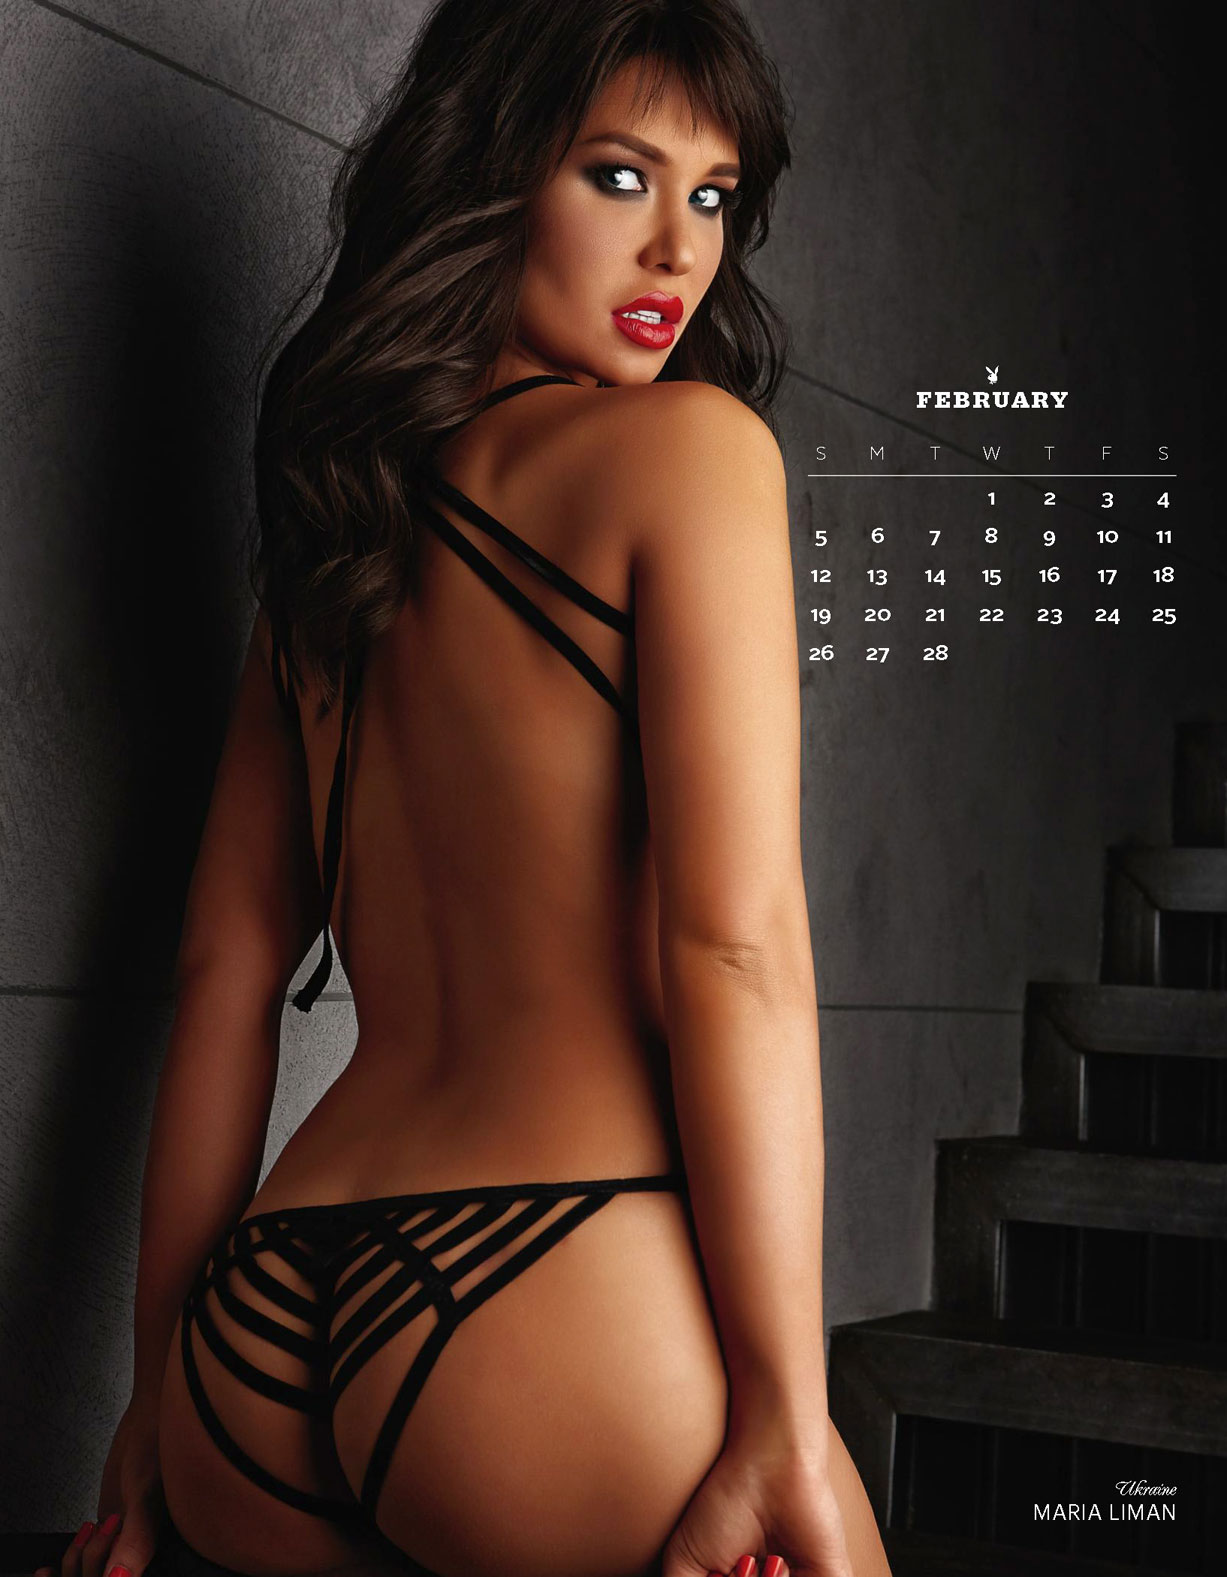 Украинка Мария Лиман в календаре Playboy USA 2017 Official Calendar - Playmates Around the World - Maria Liman | Ukraine